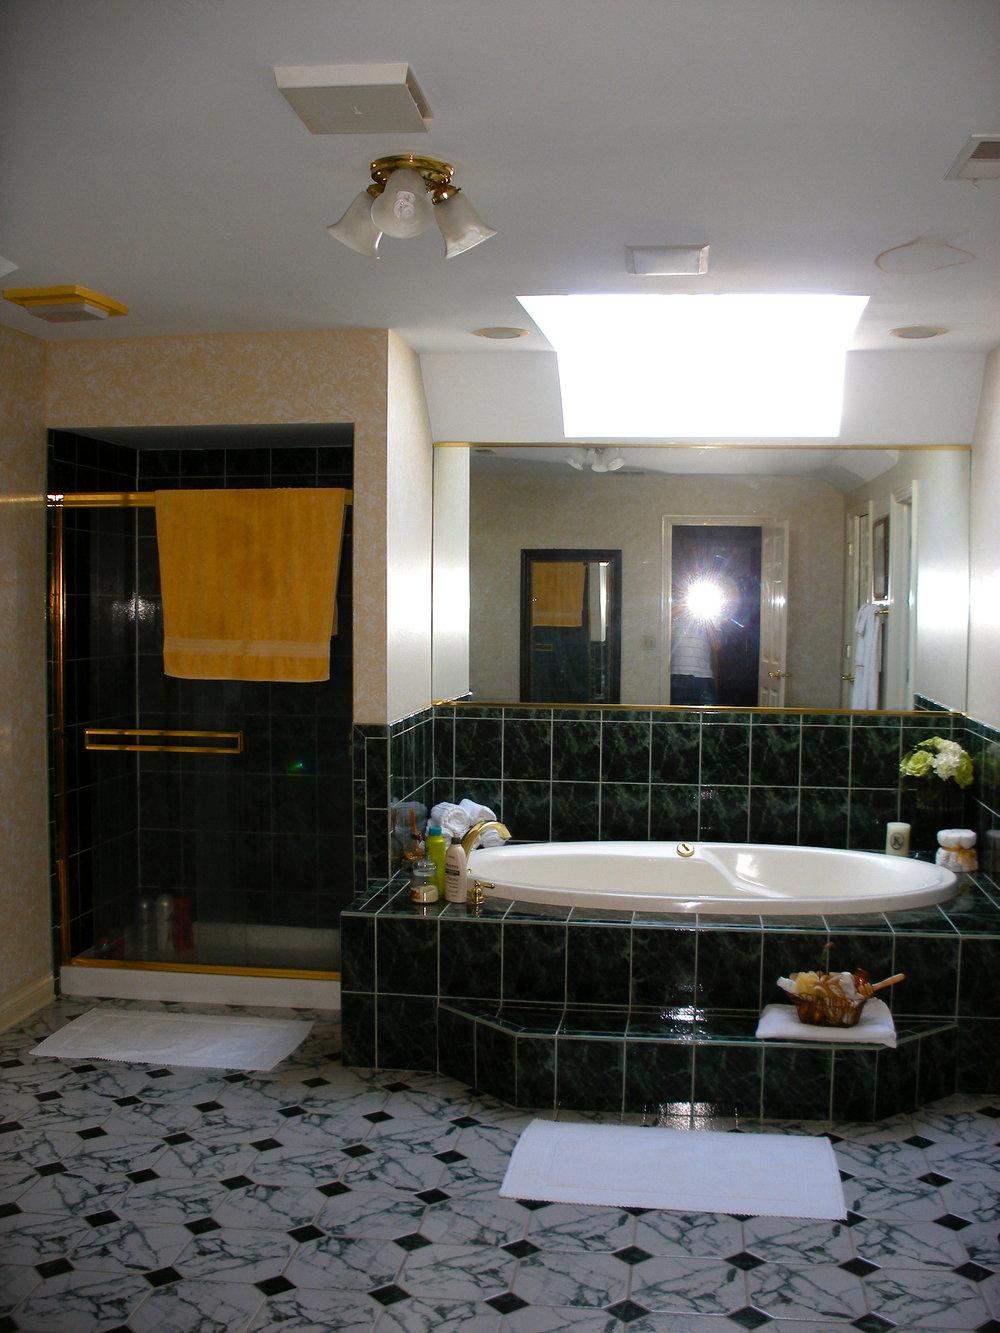 BEFORE REMODEL BATHROOM PHOTO GENEVA IL .jpg